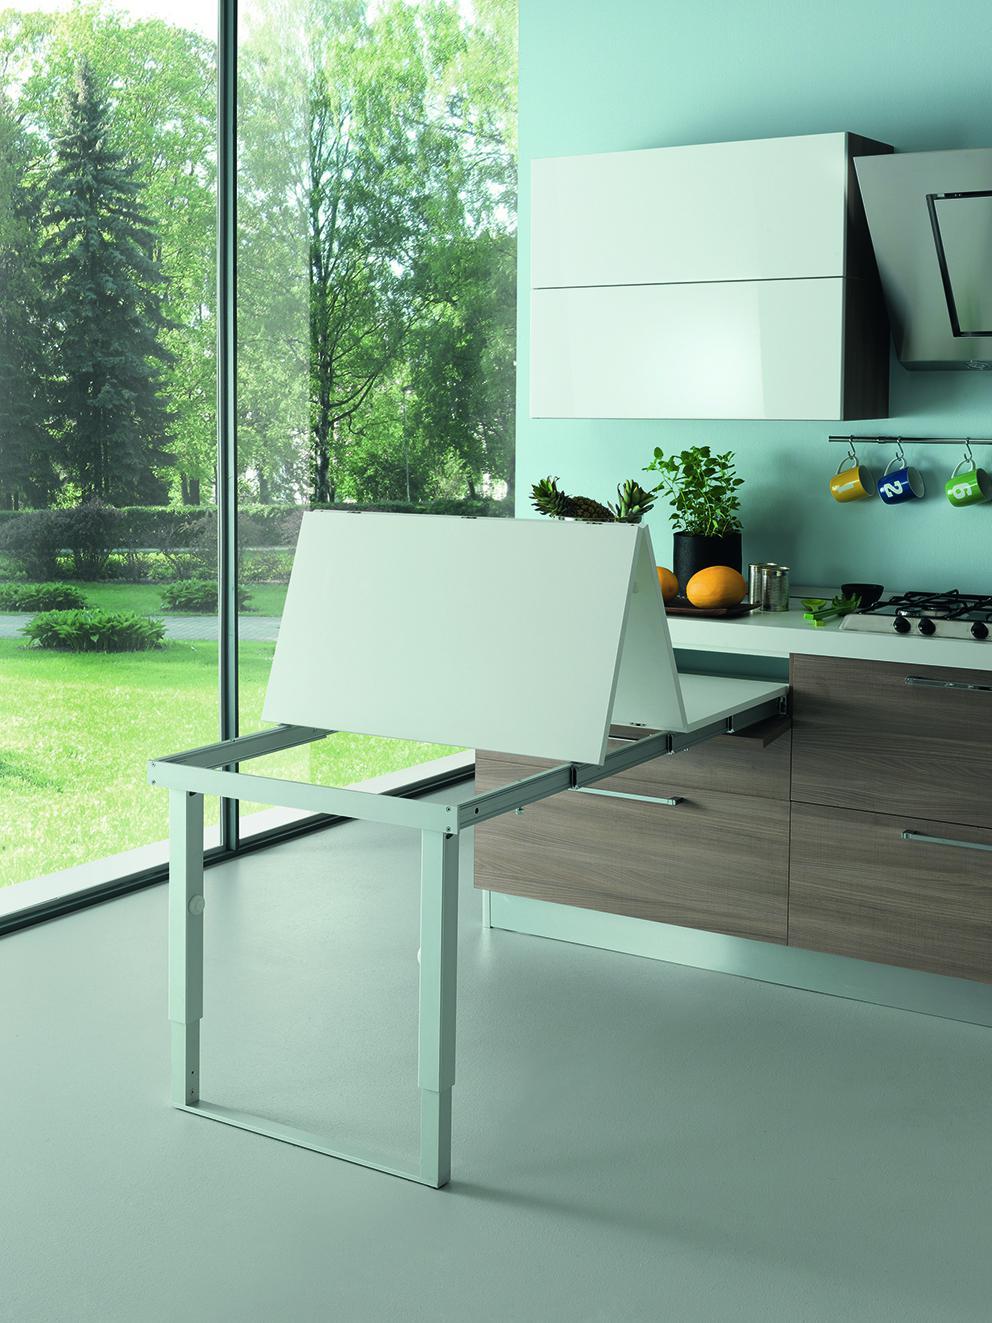 Mesa extraible con tablero plegable